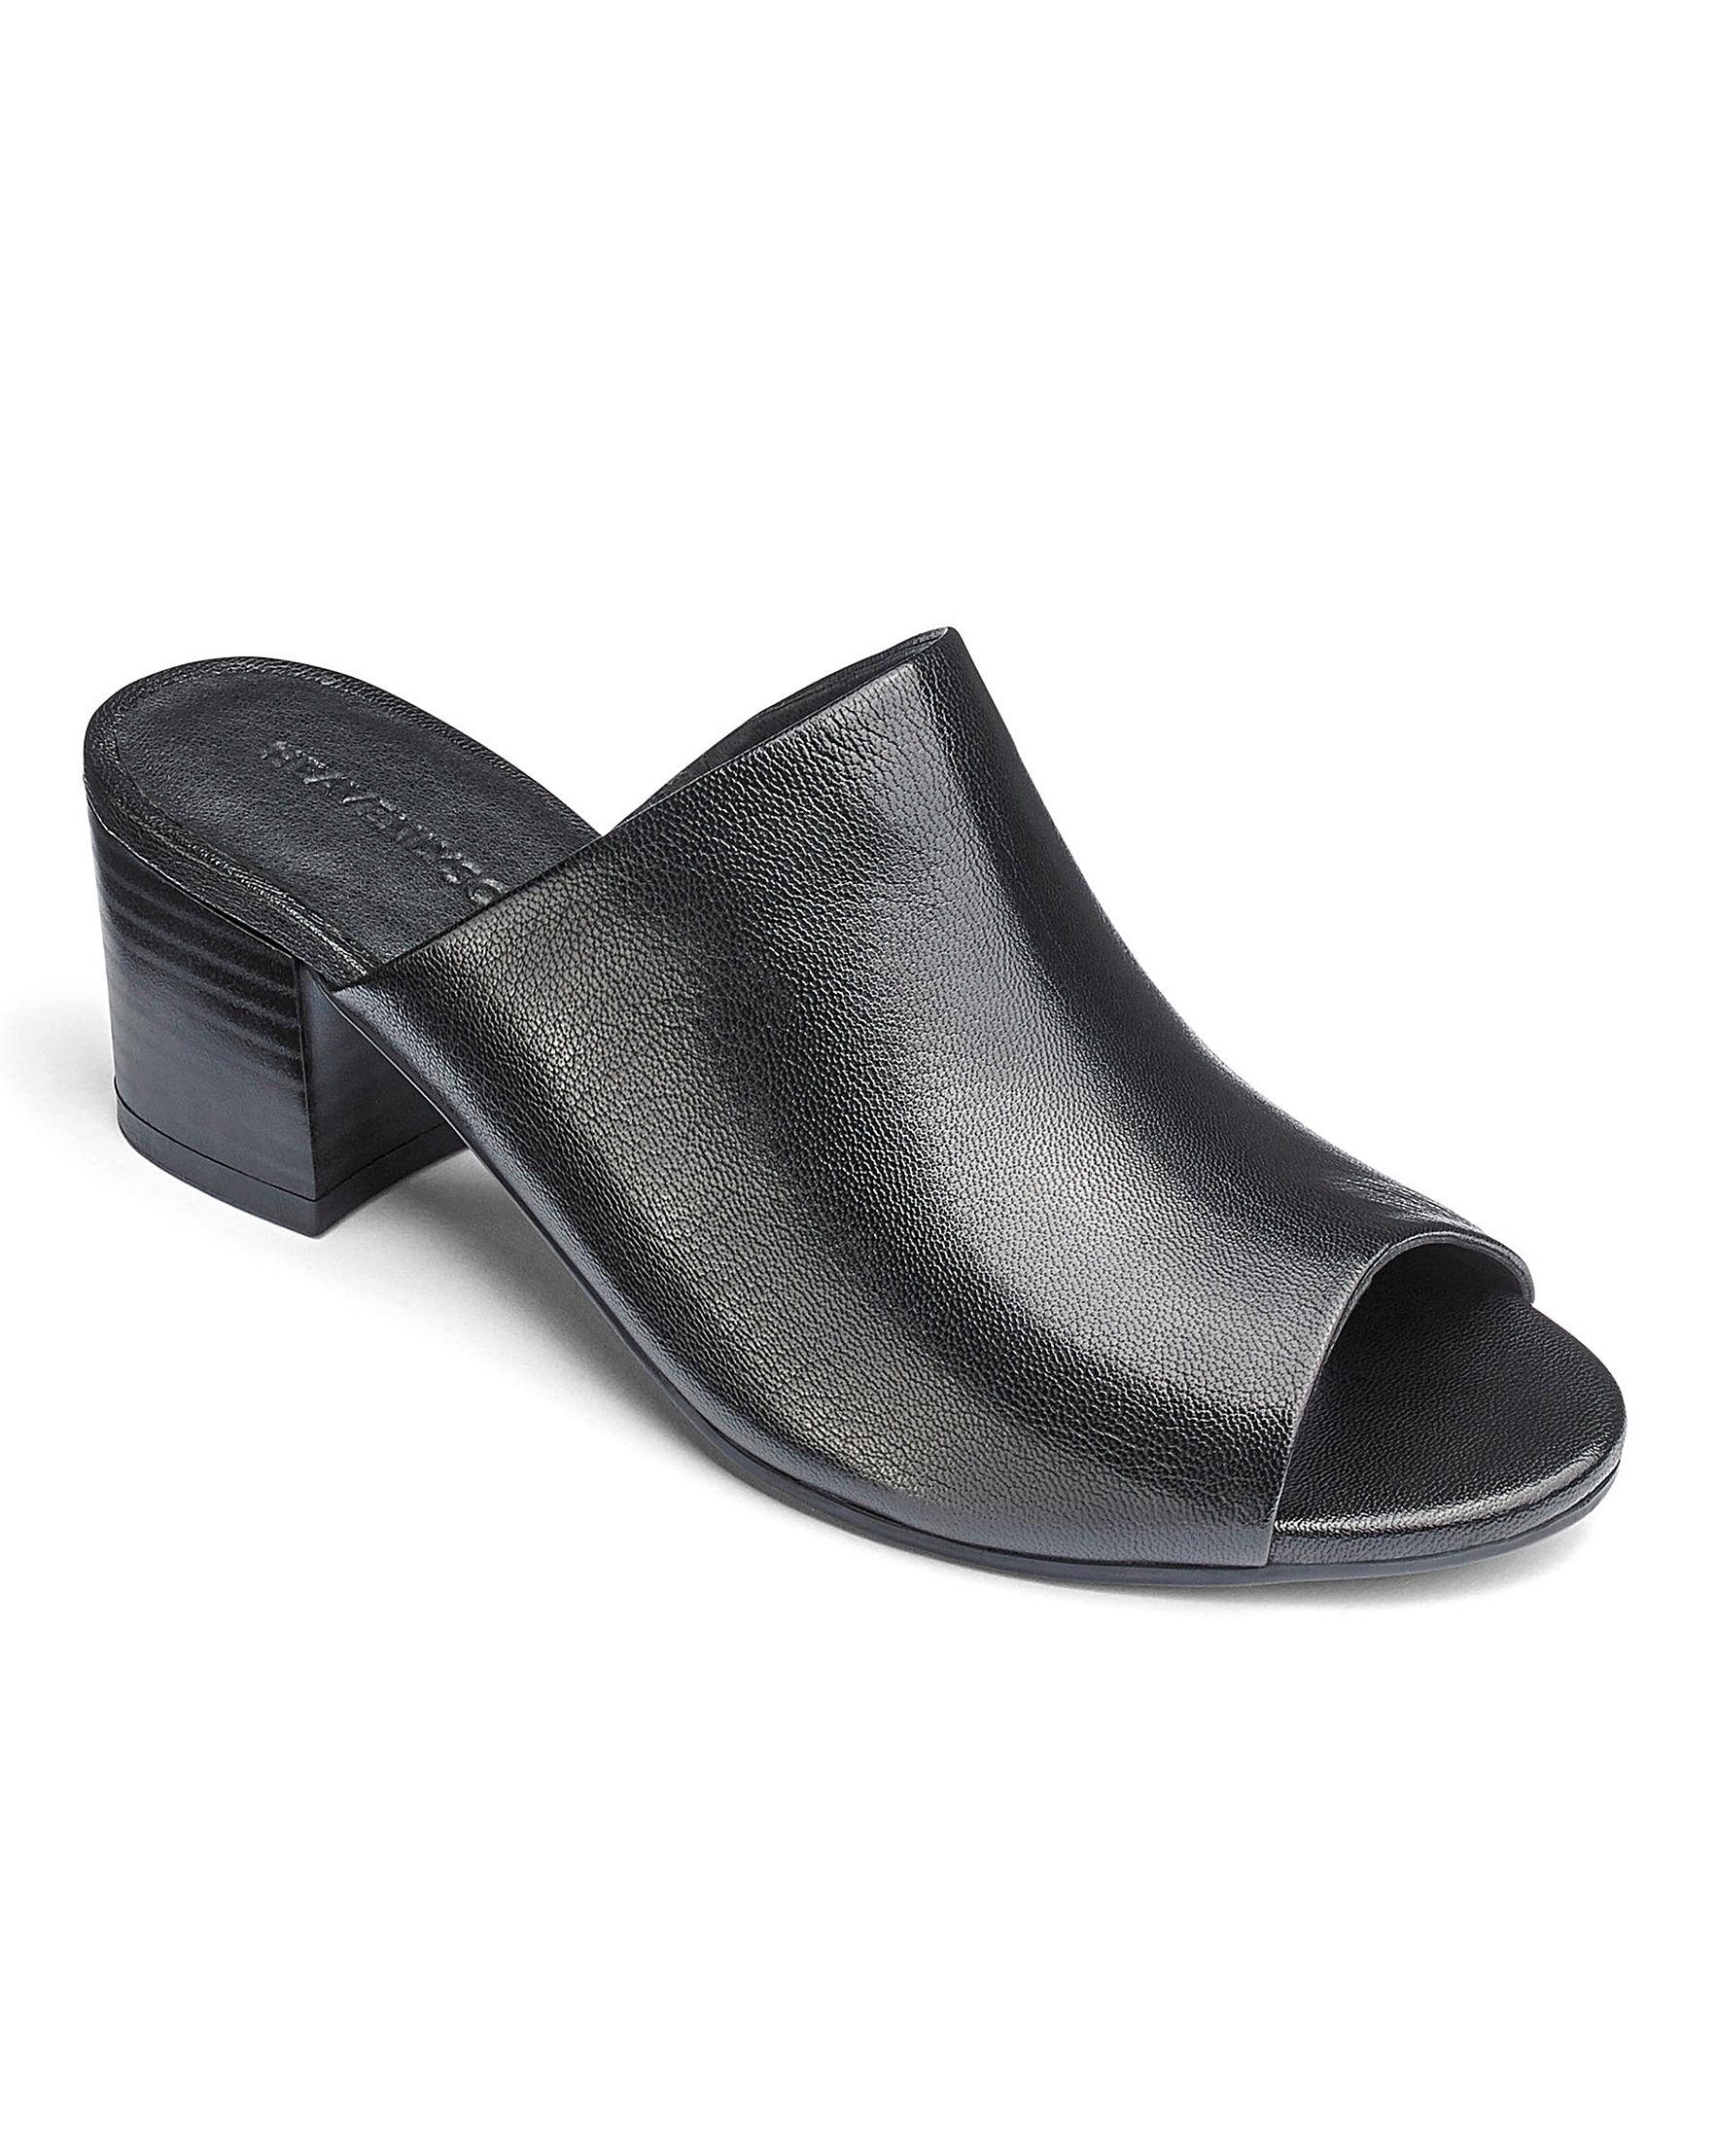 51ecb10c8fa Slip On Leather Mules EEE Fit